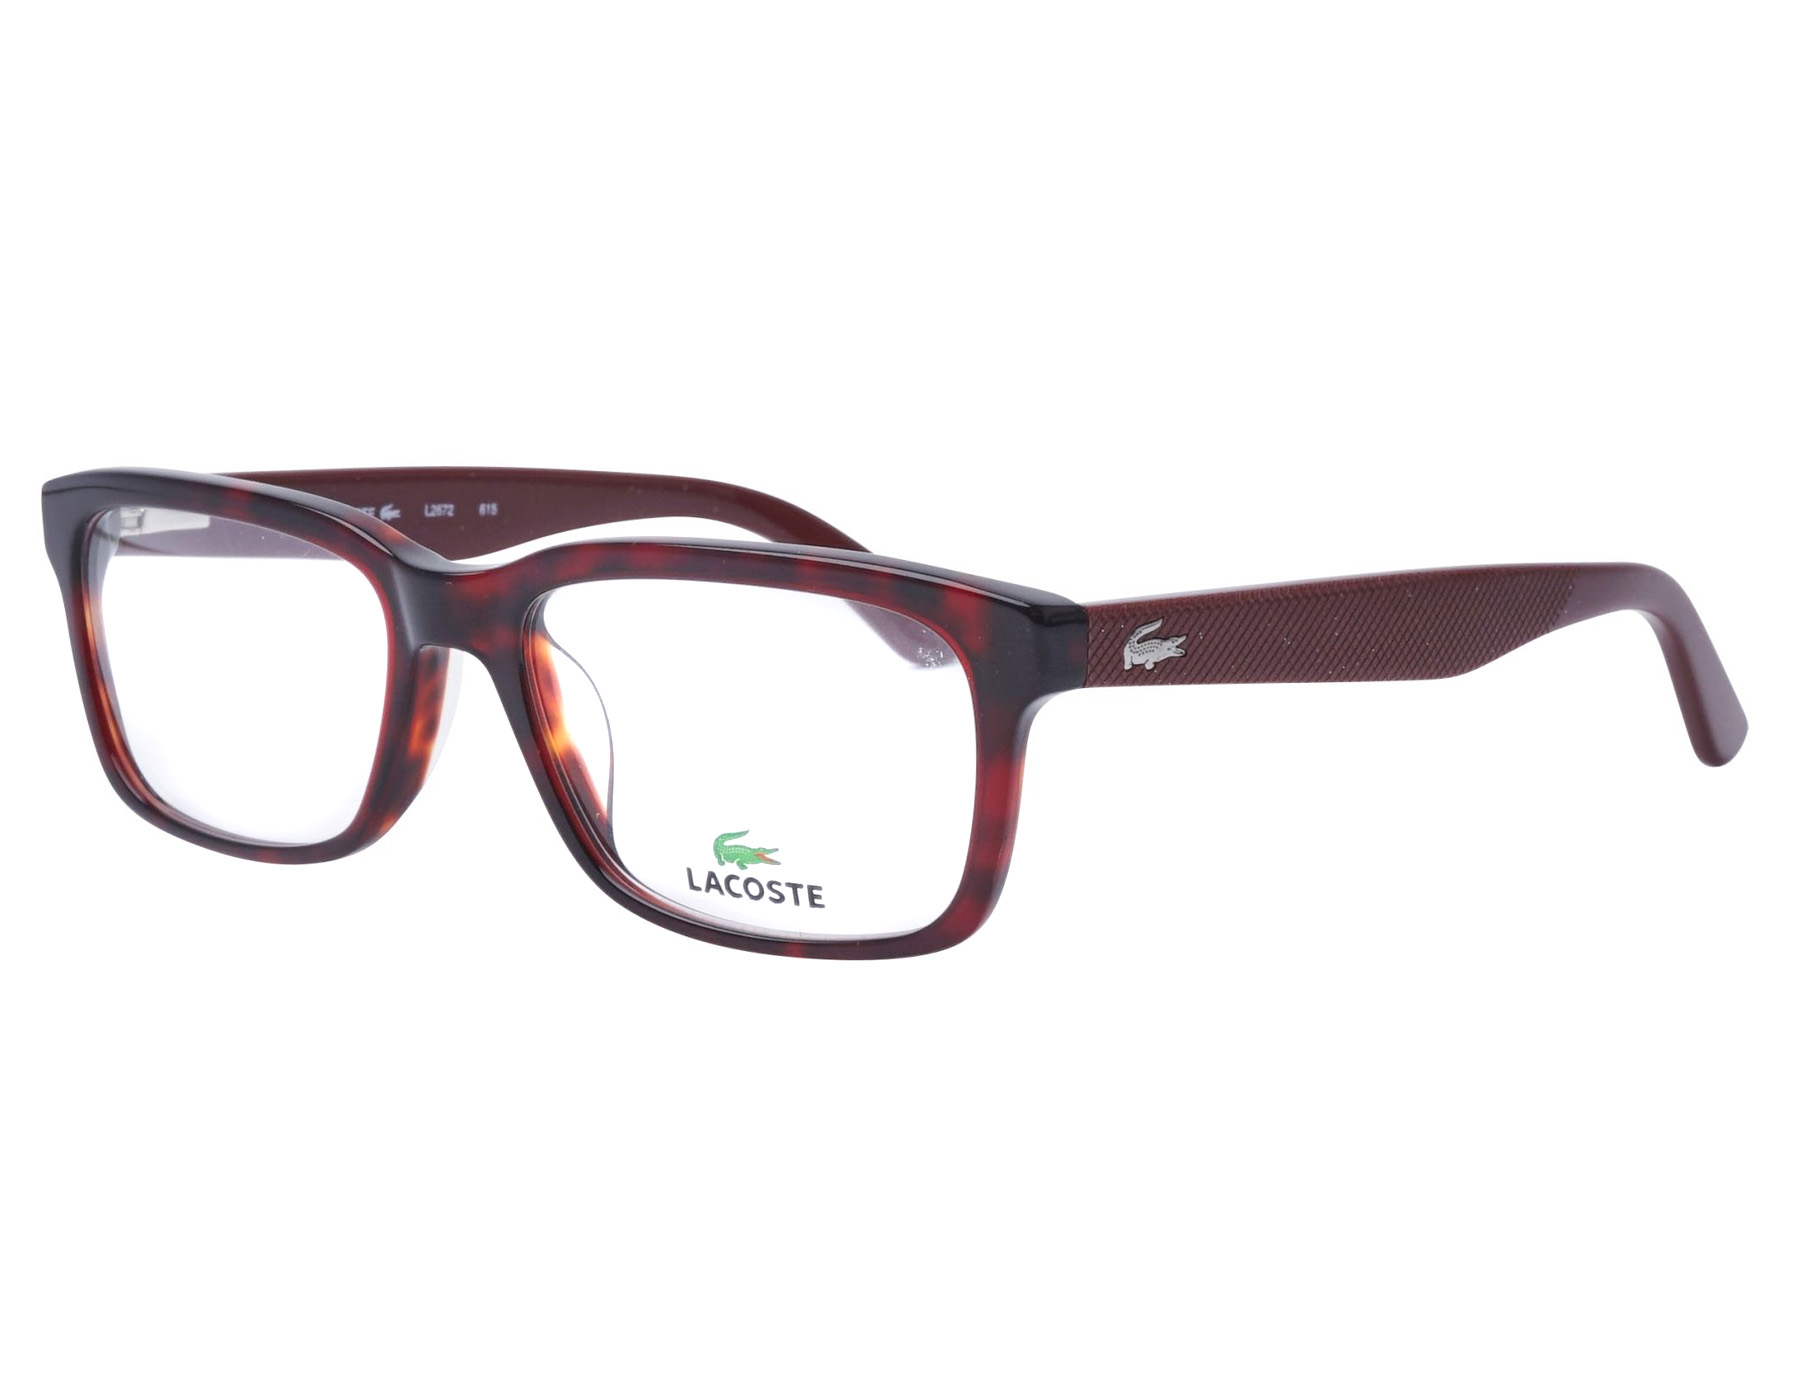 c451b53fed2 NEW Lacoste L2672 615 54mm Red Havana Optical Eyeglasses Frames ...